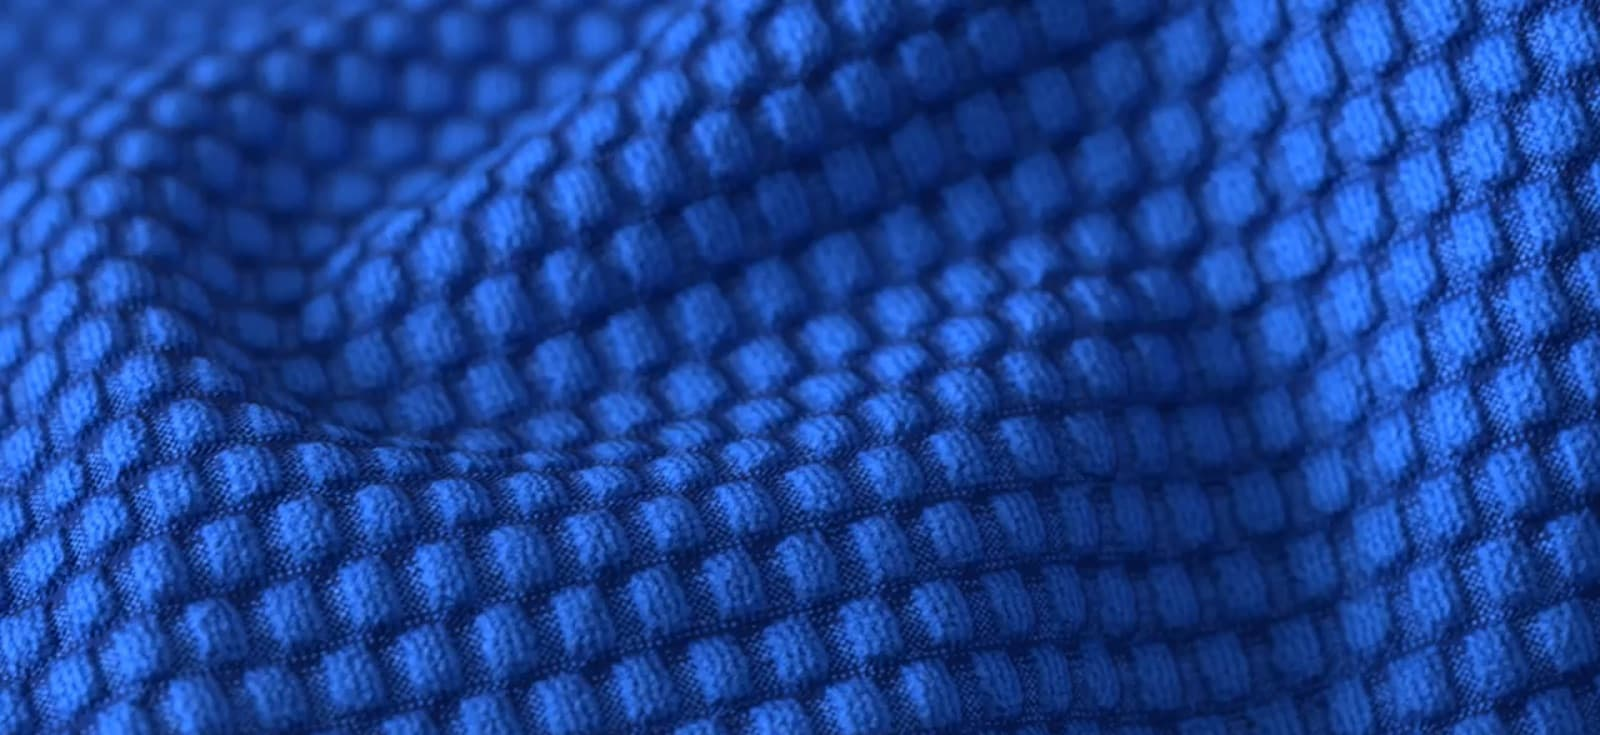 Weekly Drills 019 - #fabric